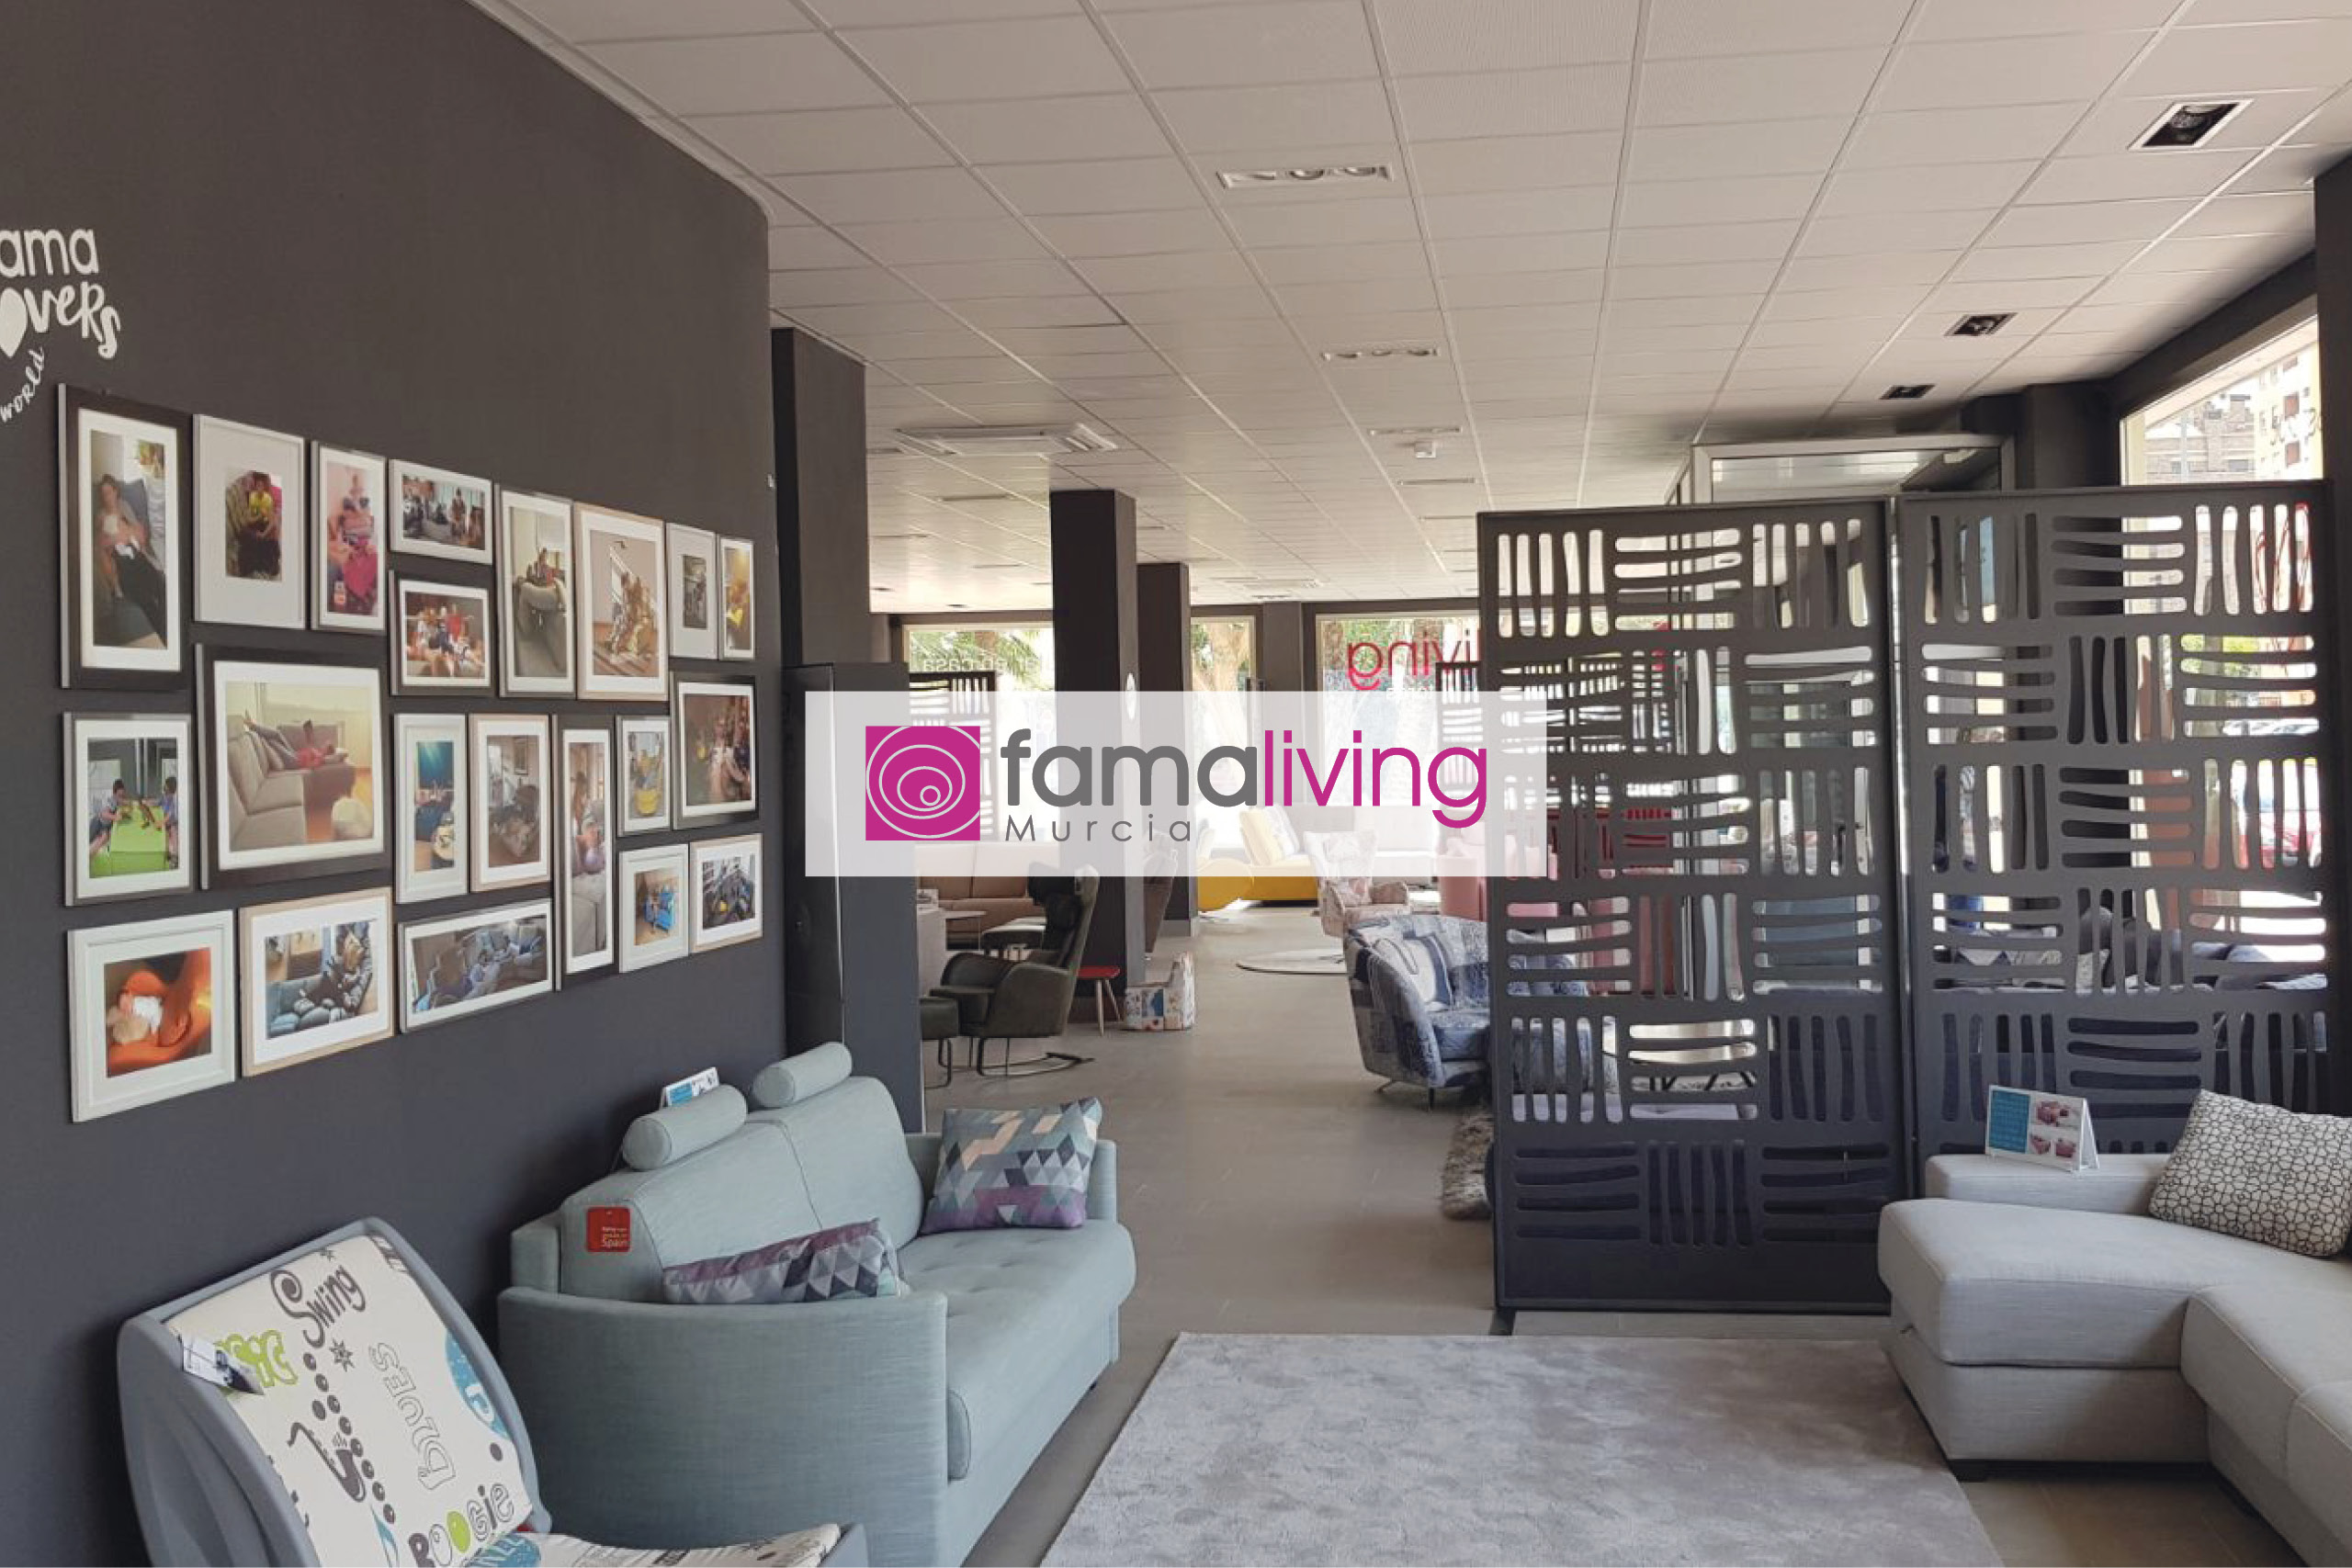 Famaliving Murcia - Tienda de sofás